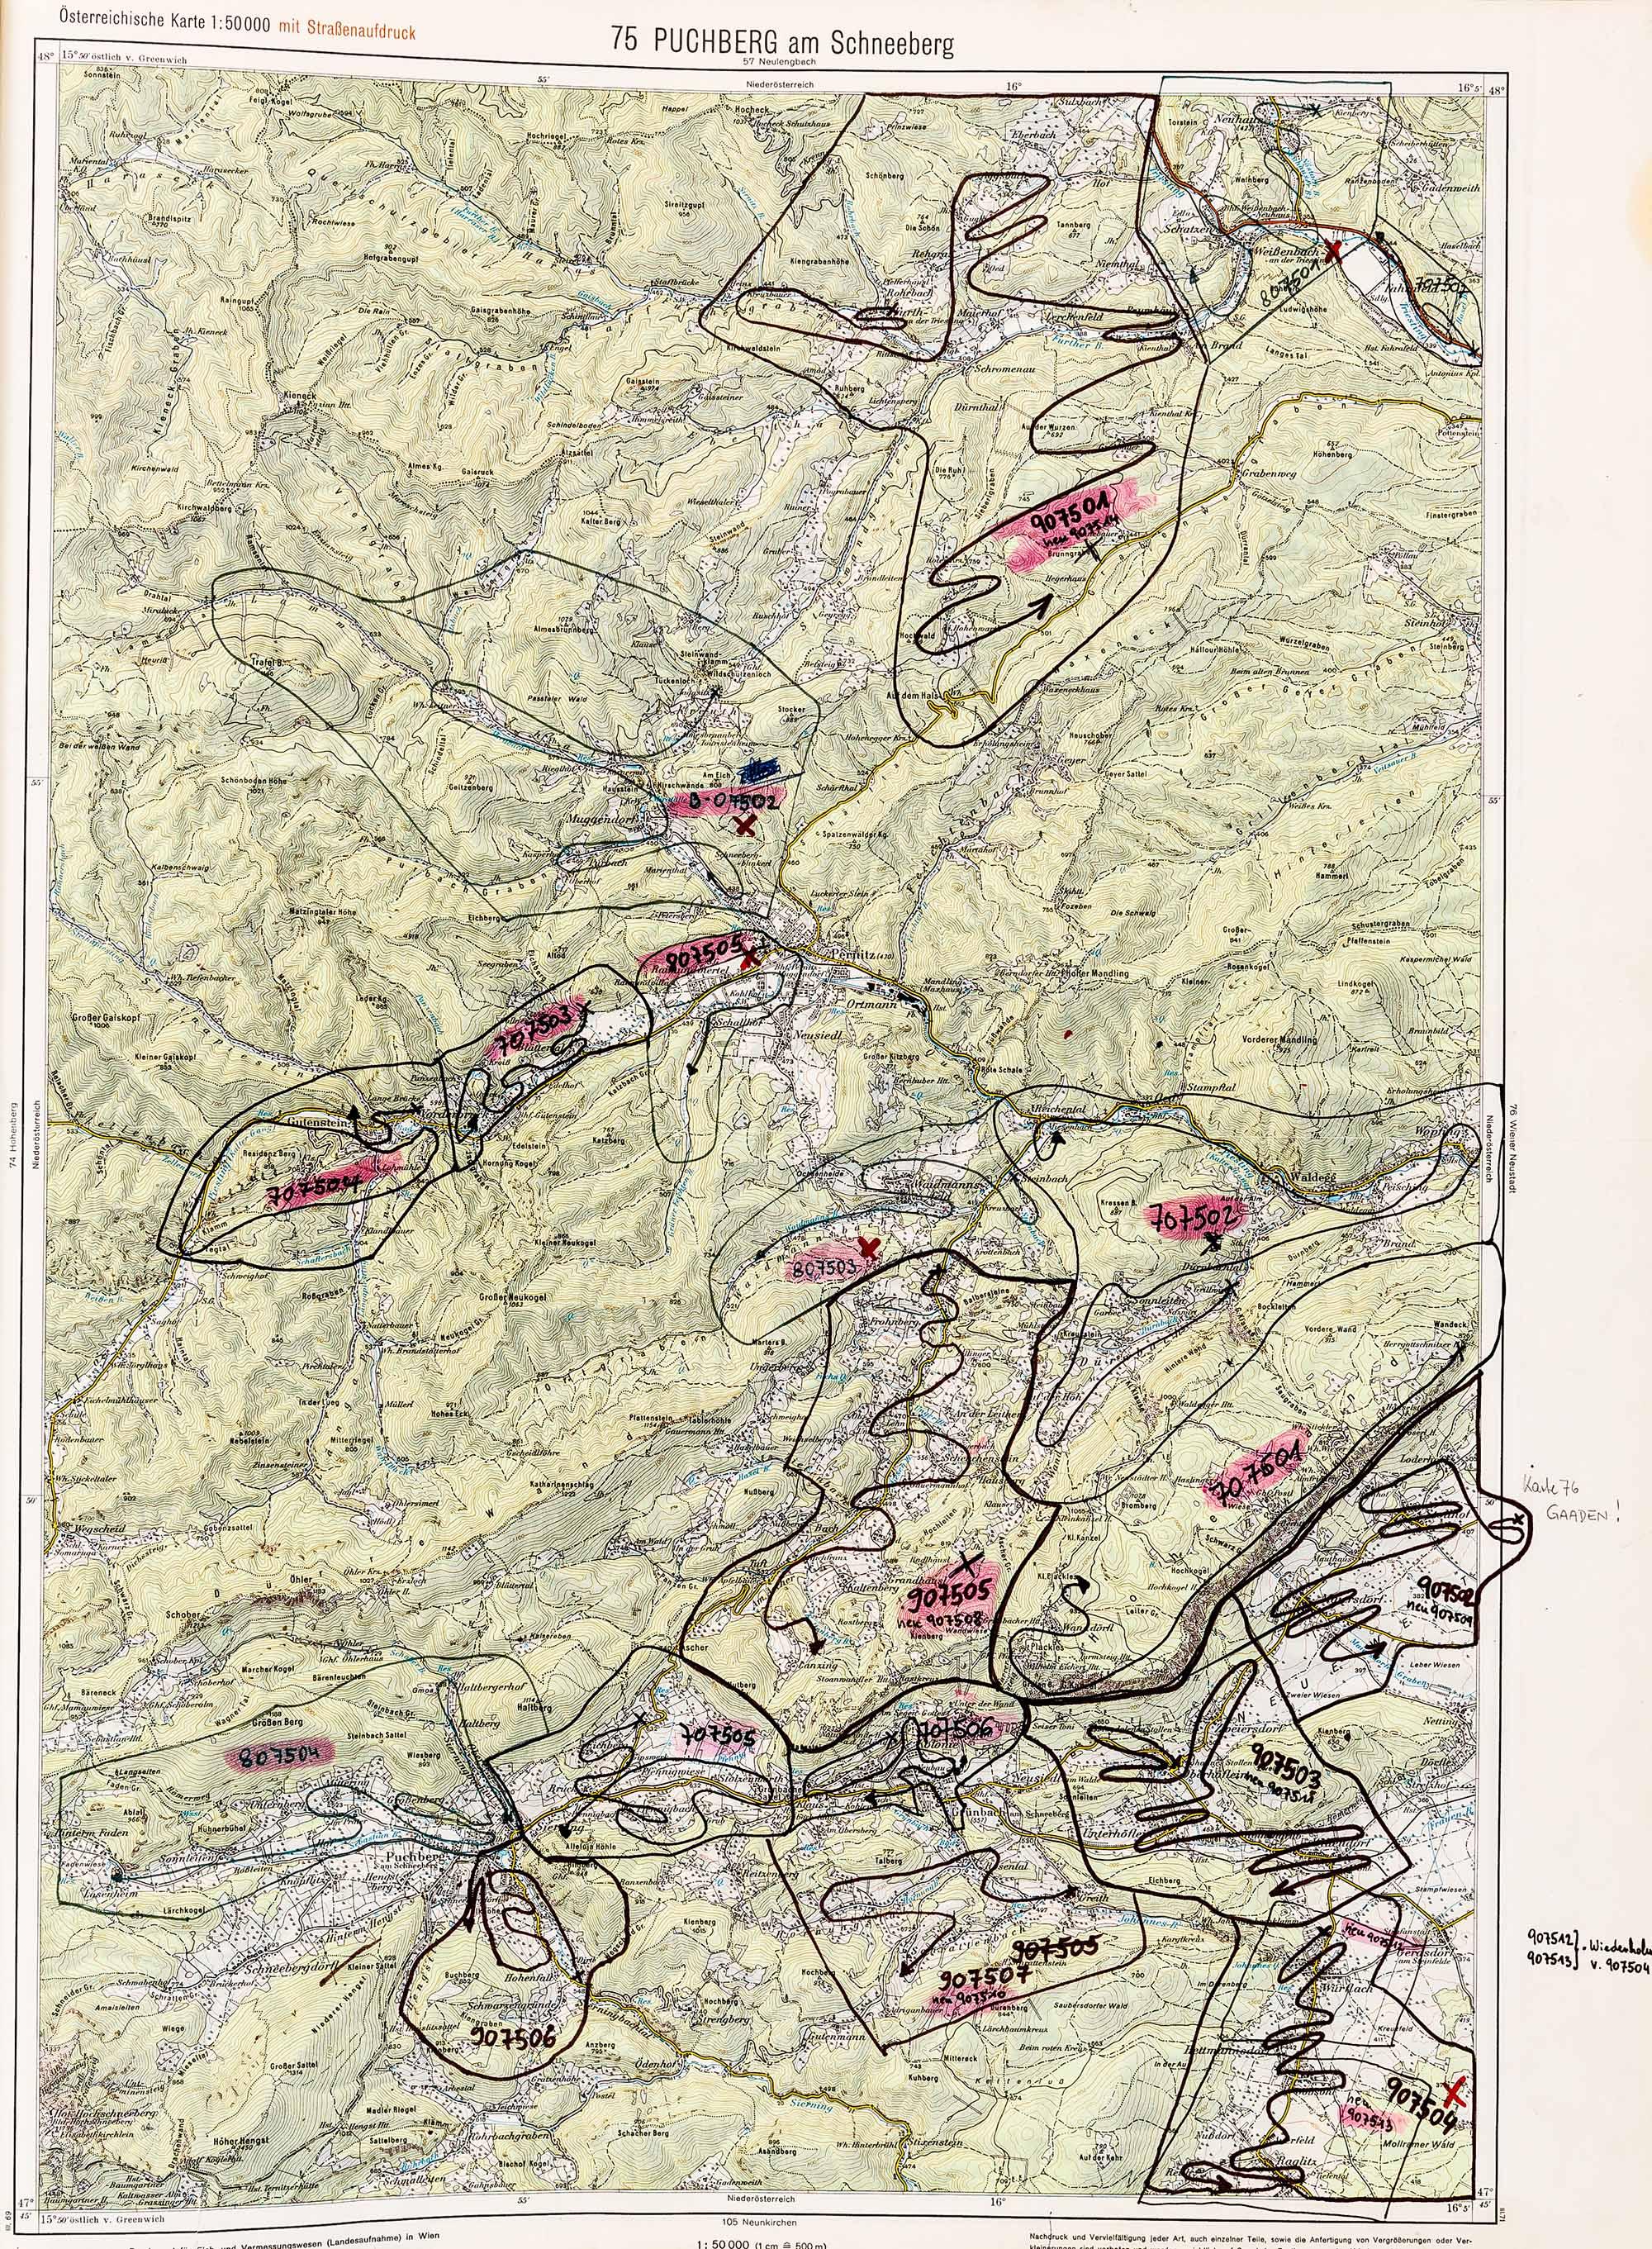 1975-1979 Karte 075